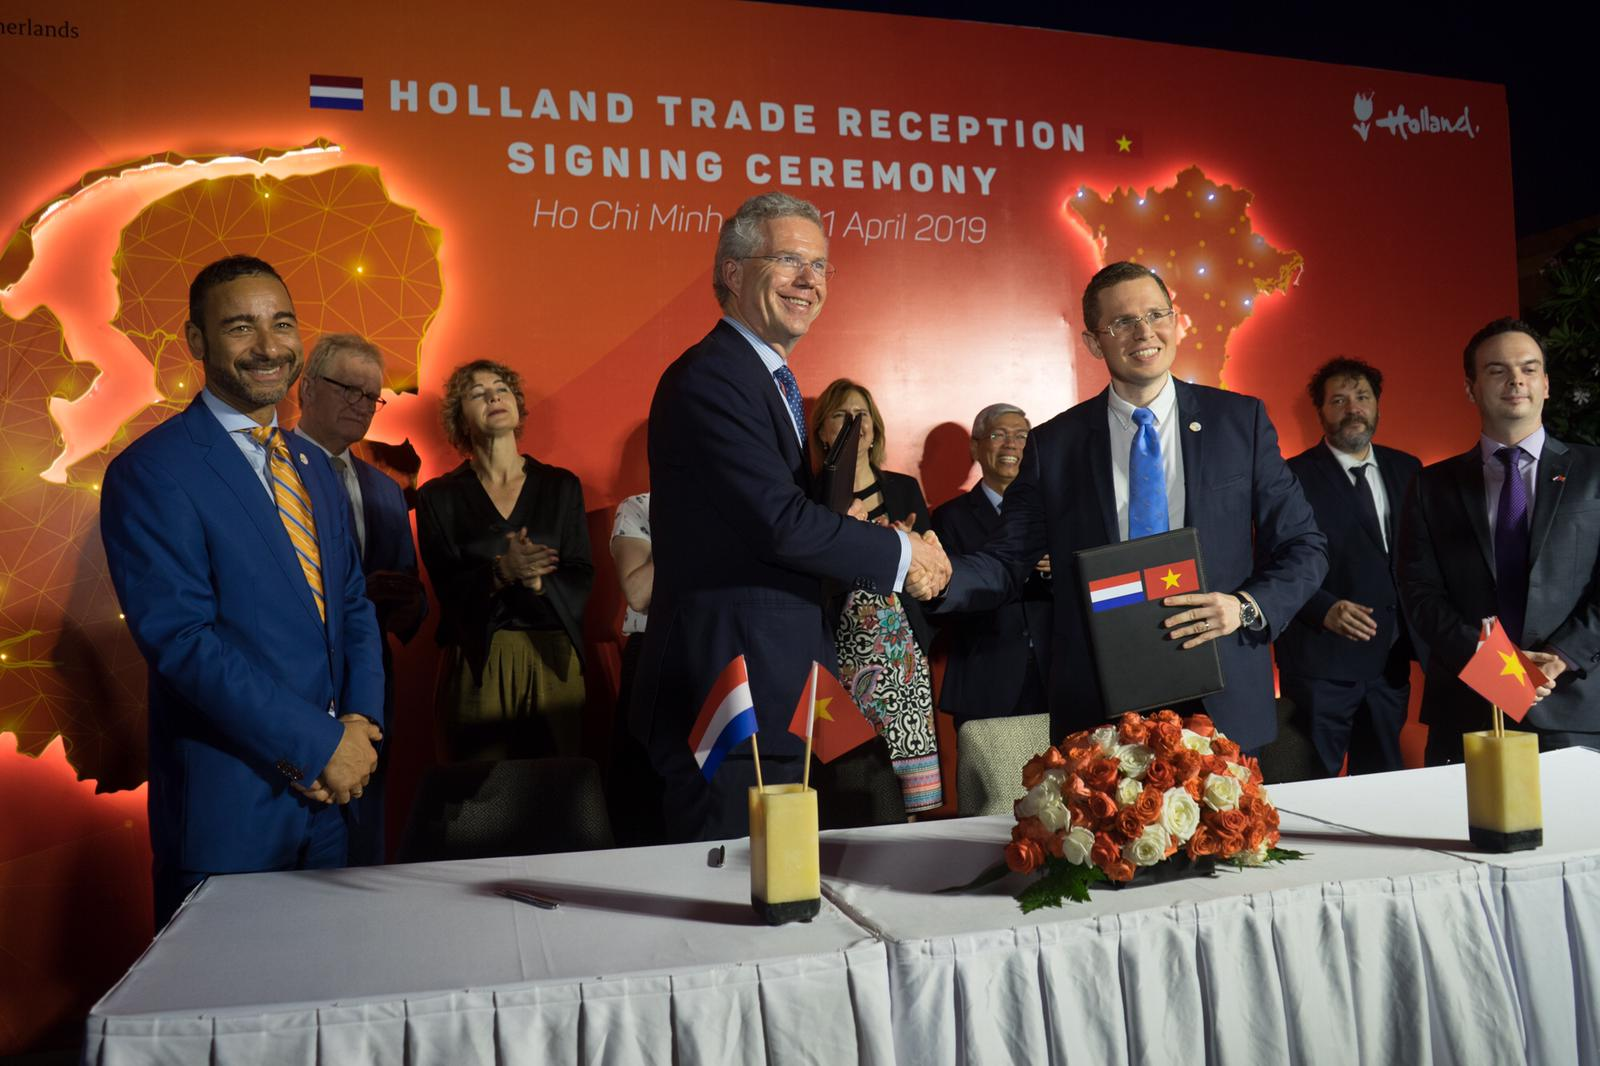 Handelsmissie Vietnam met minister-president Rutte